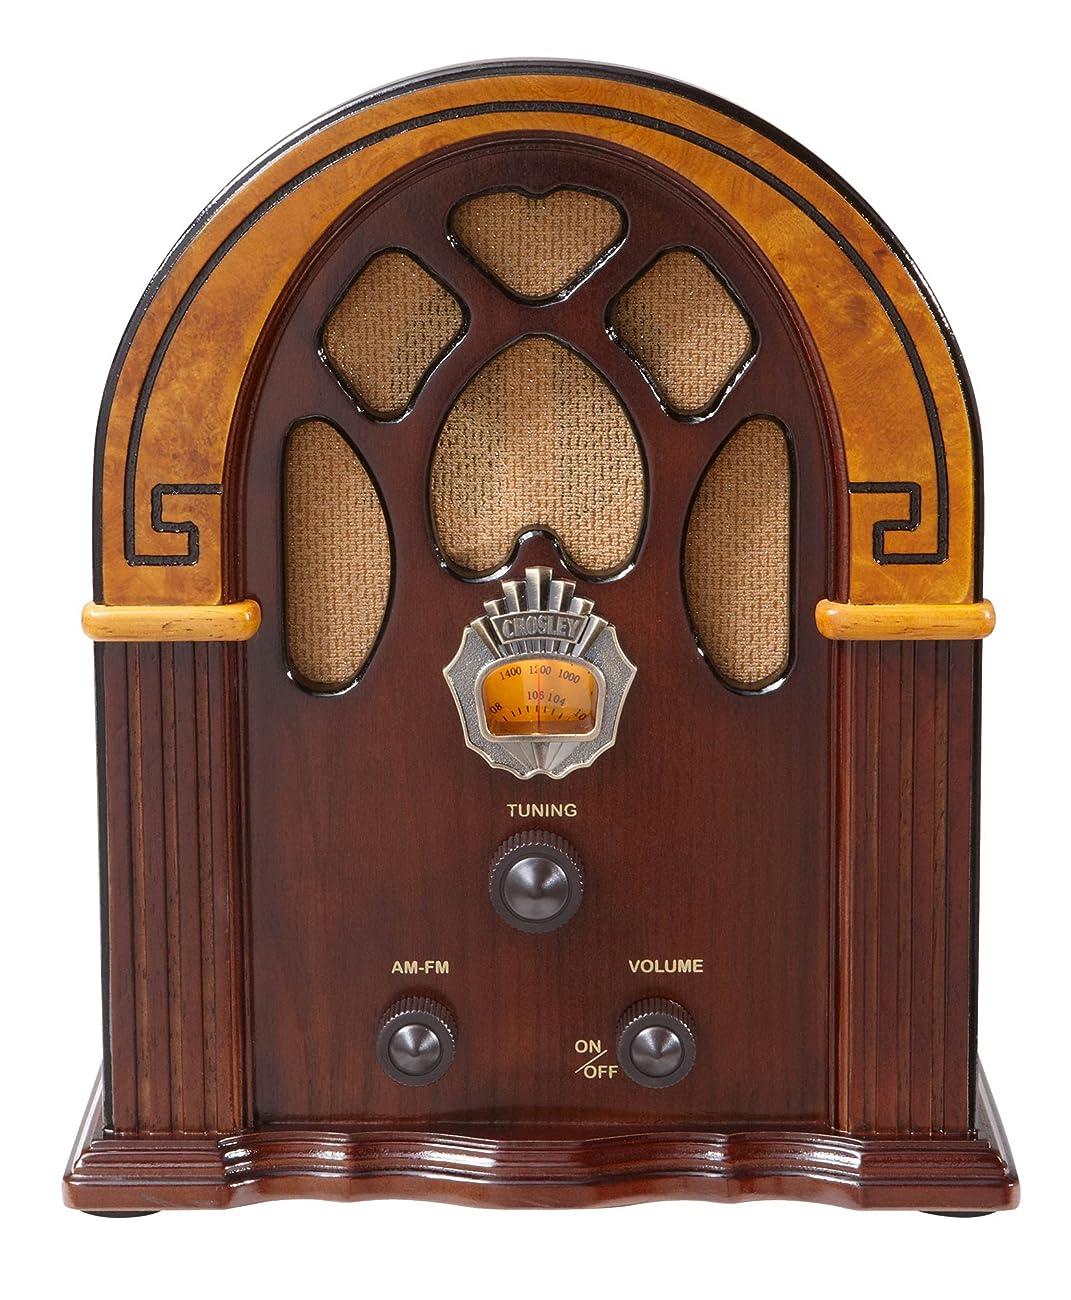 Crosley CR31-WA Companion Retro AM/FM Radio with Full-Range Speaker, Walnut & Burl 1